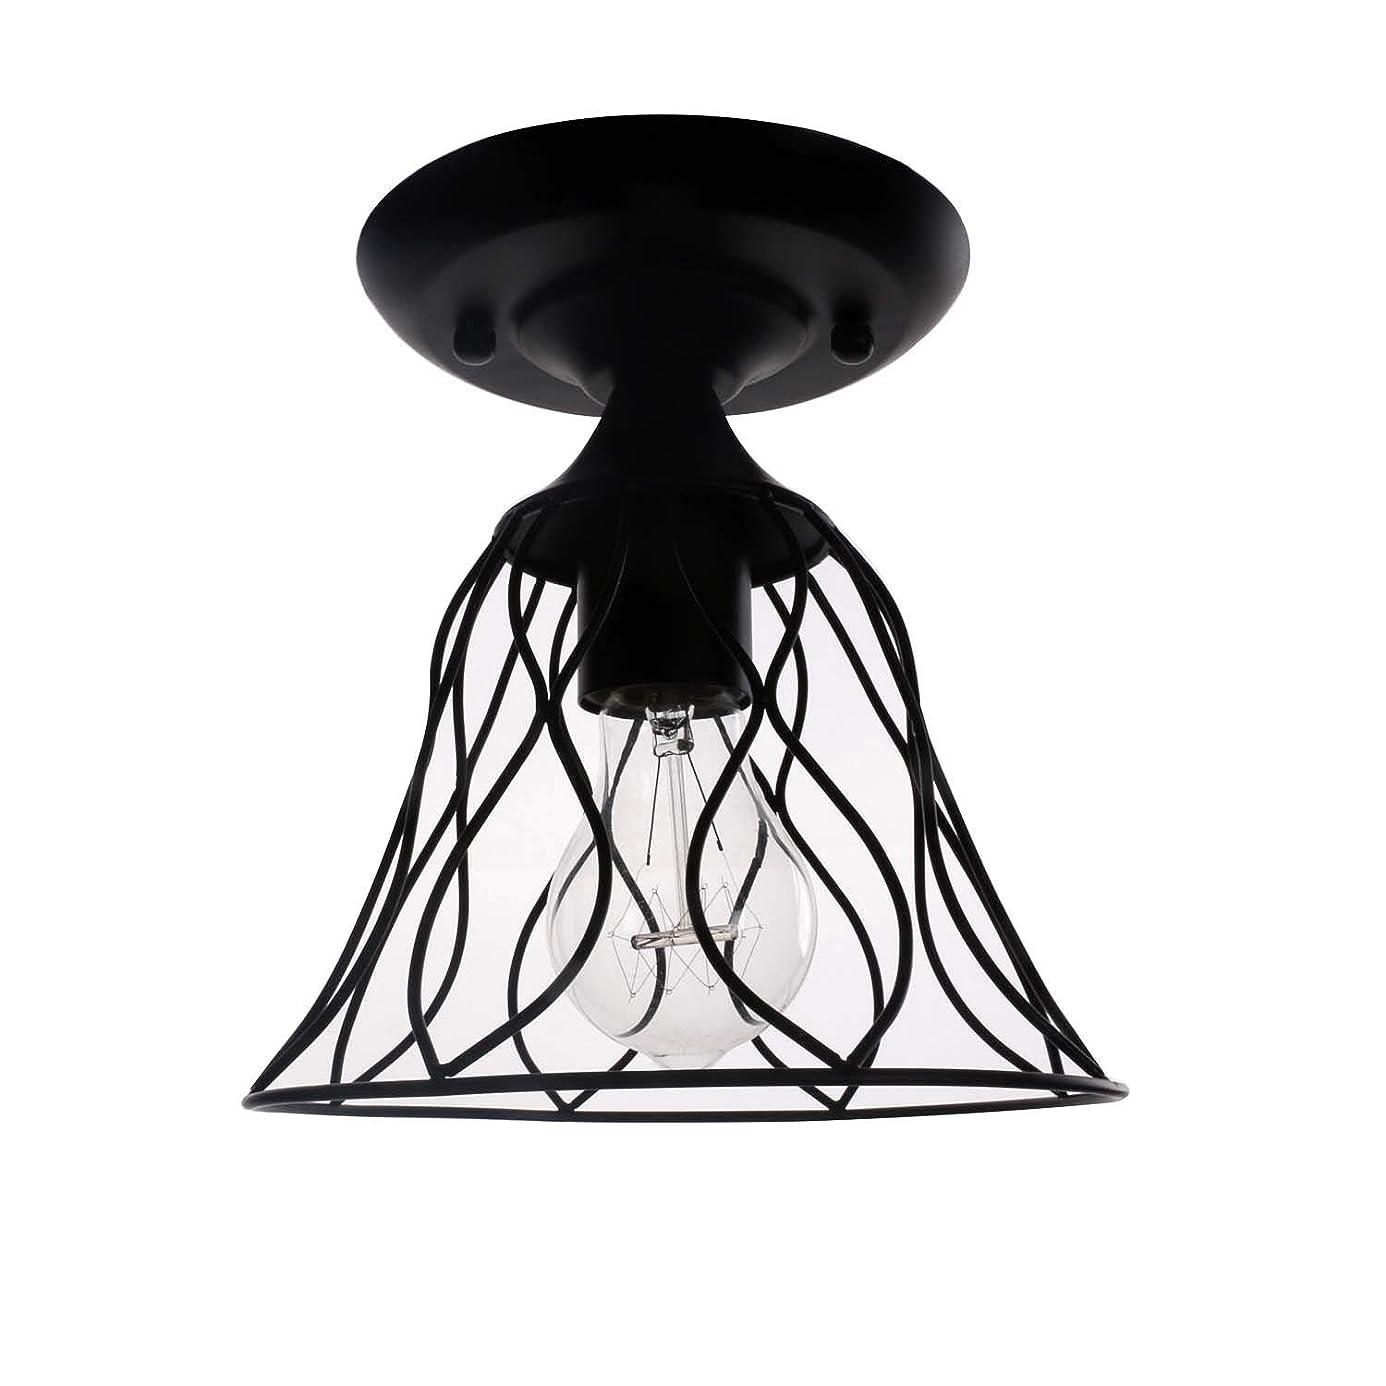 FEE-ZC Iron Art Ceiling Ligh Black Horn Cage Shade Hanging Lamp Chandelier Modern Nordic Vintage Industry Pendant Light Indoor Cafe Corridor, Black